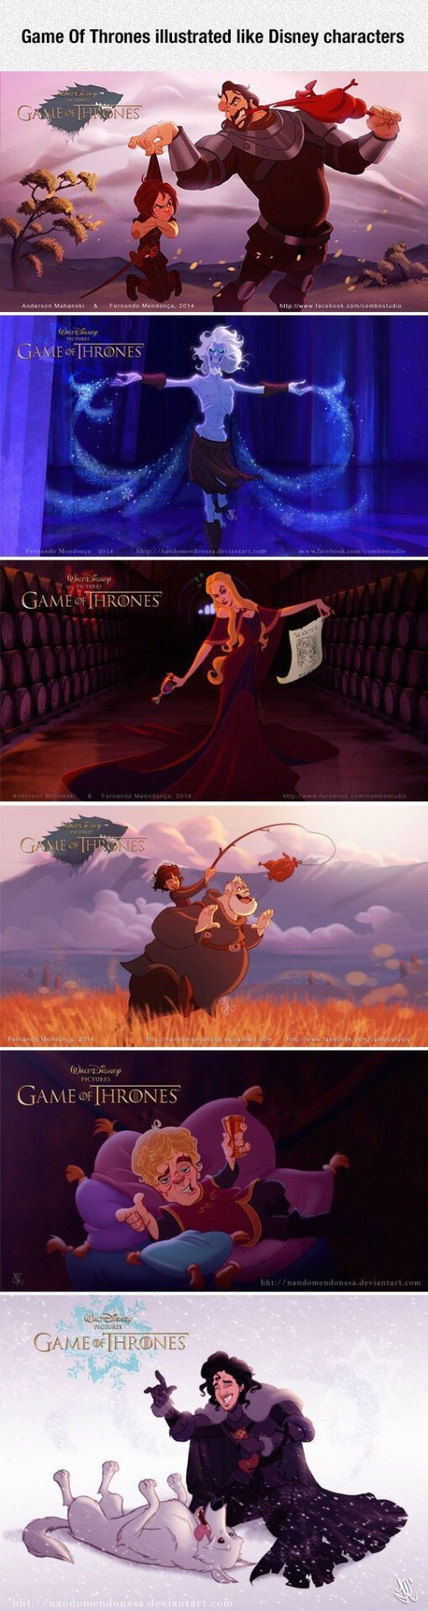 Game of thrones - meme